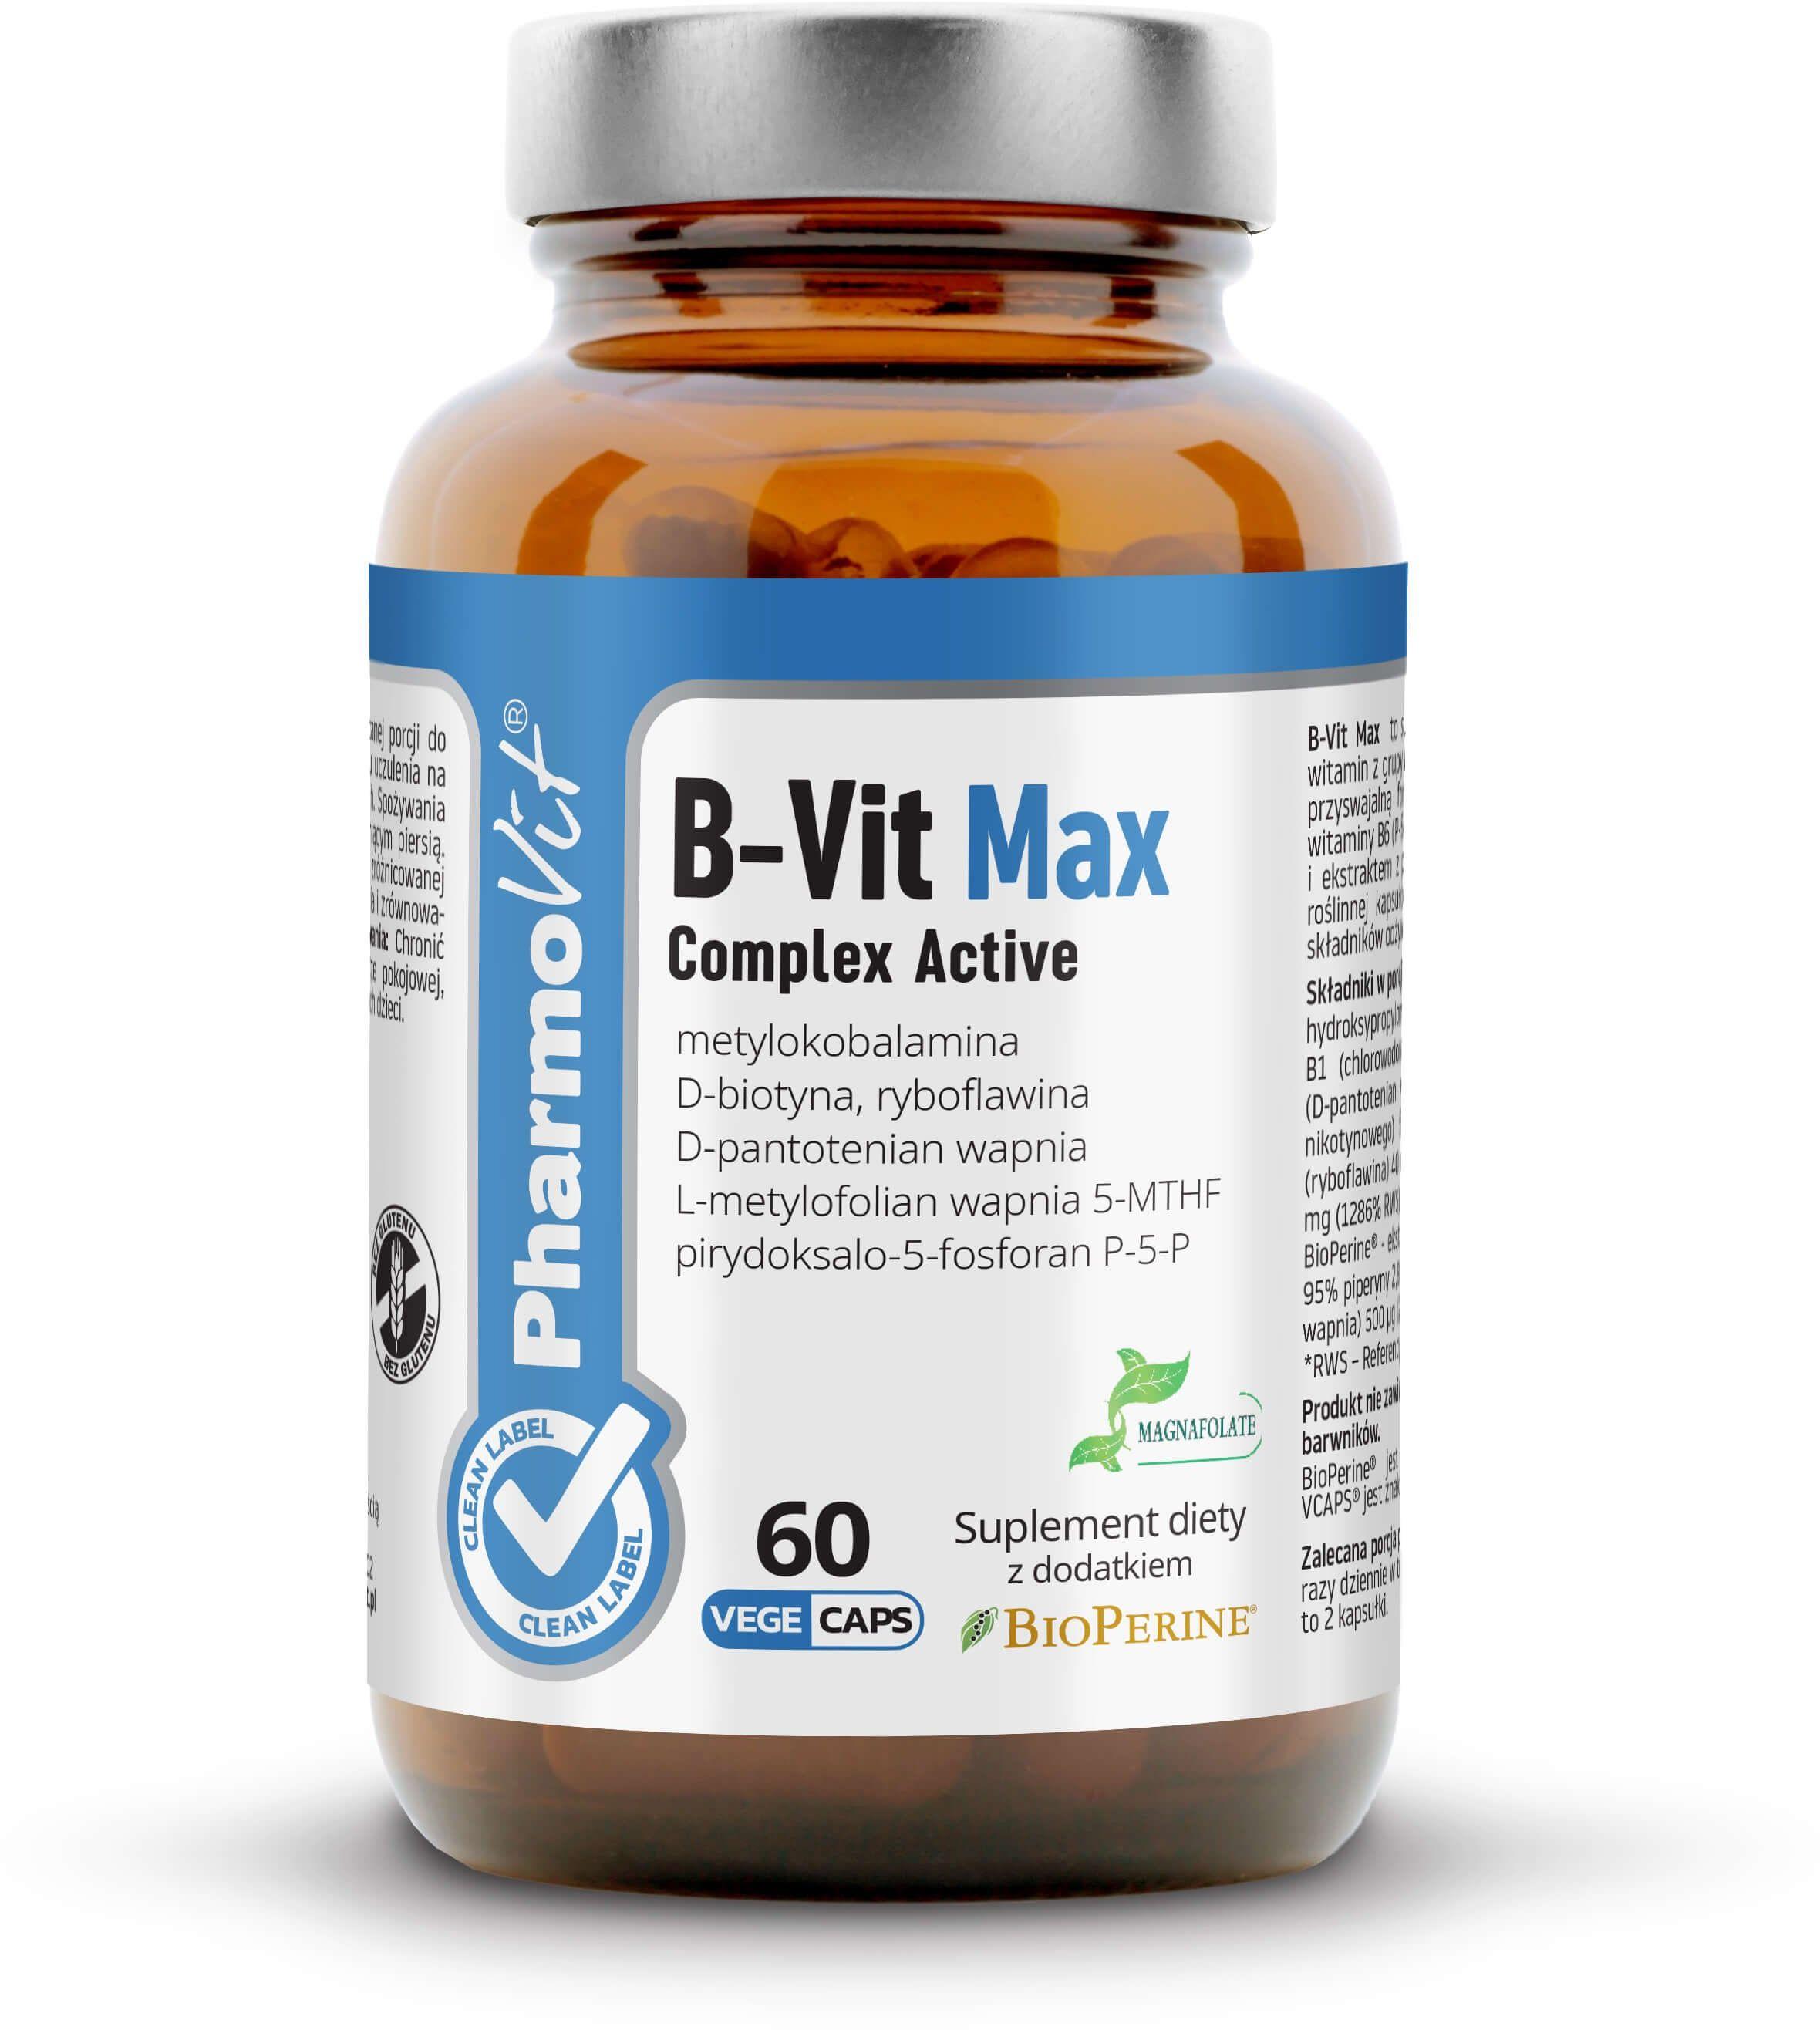 B-VIT Max Witaminy B-Complex Active (60 kaps) CLEAN Pharmovit